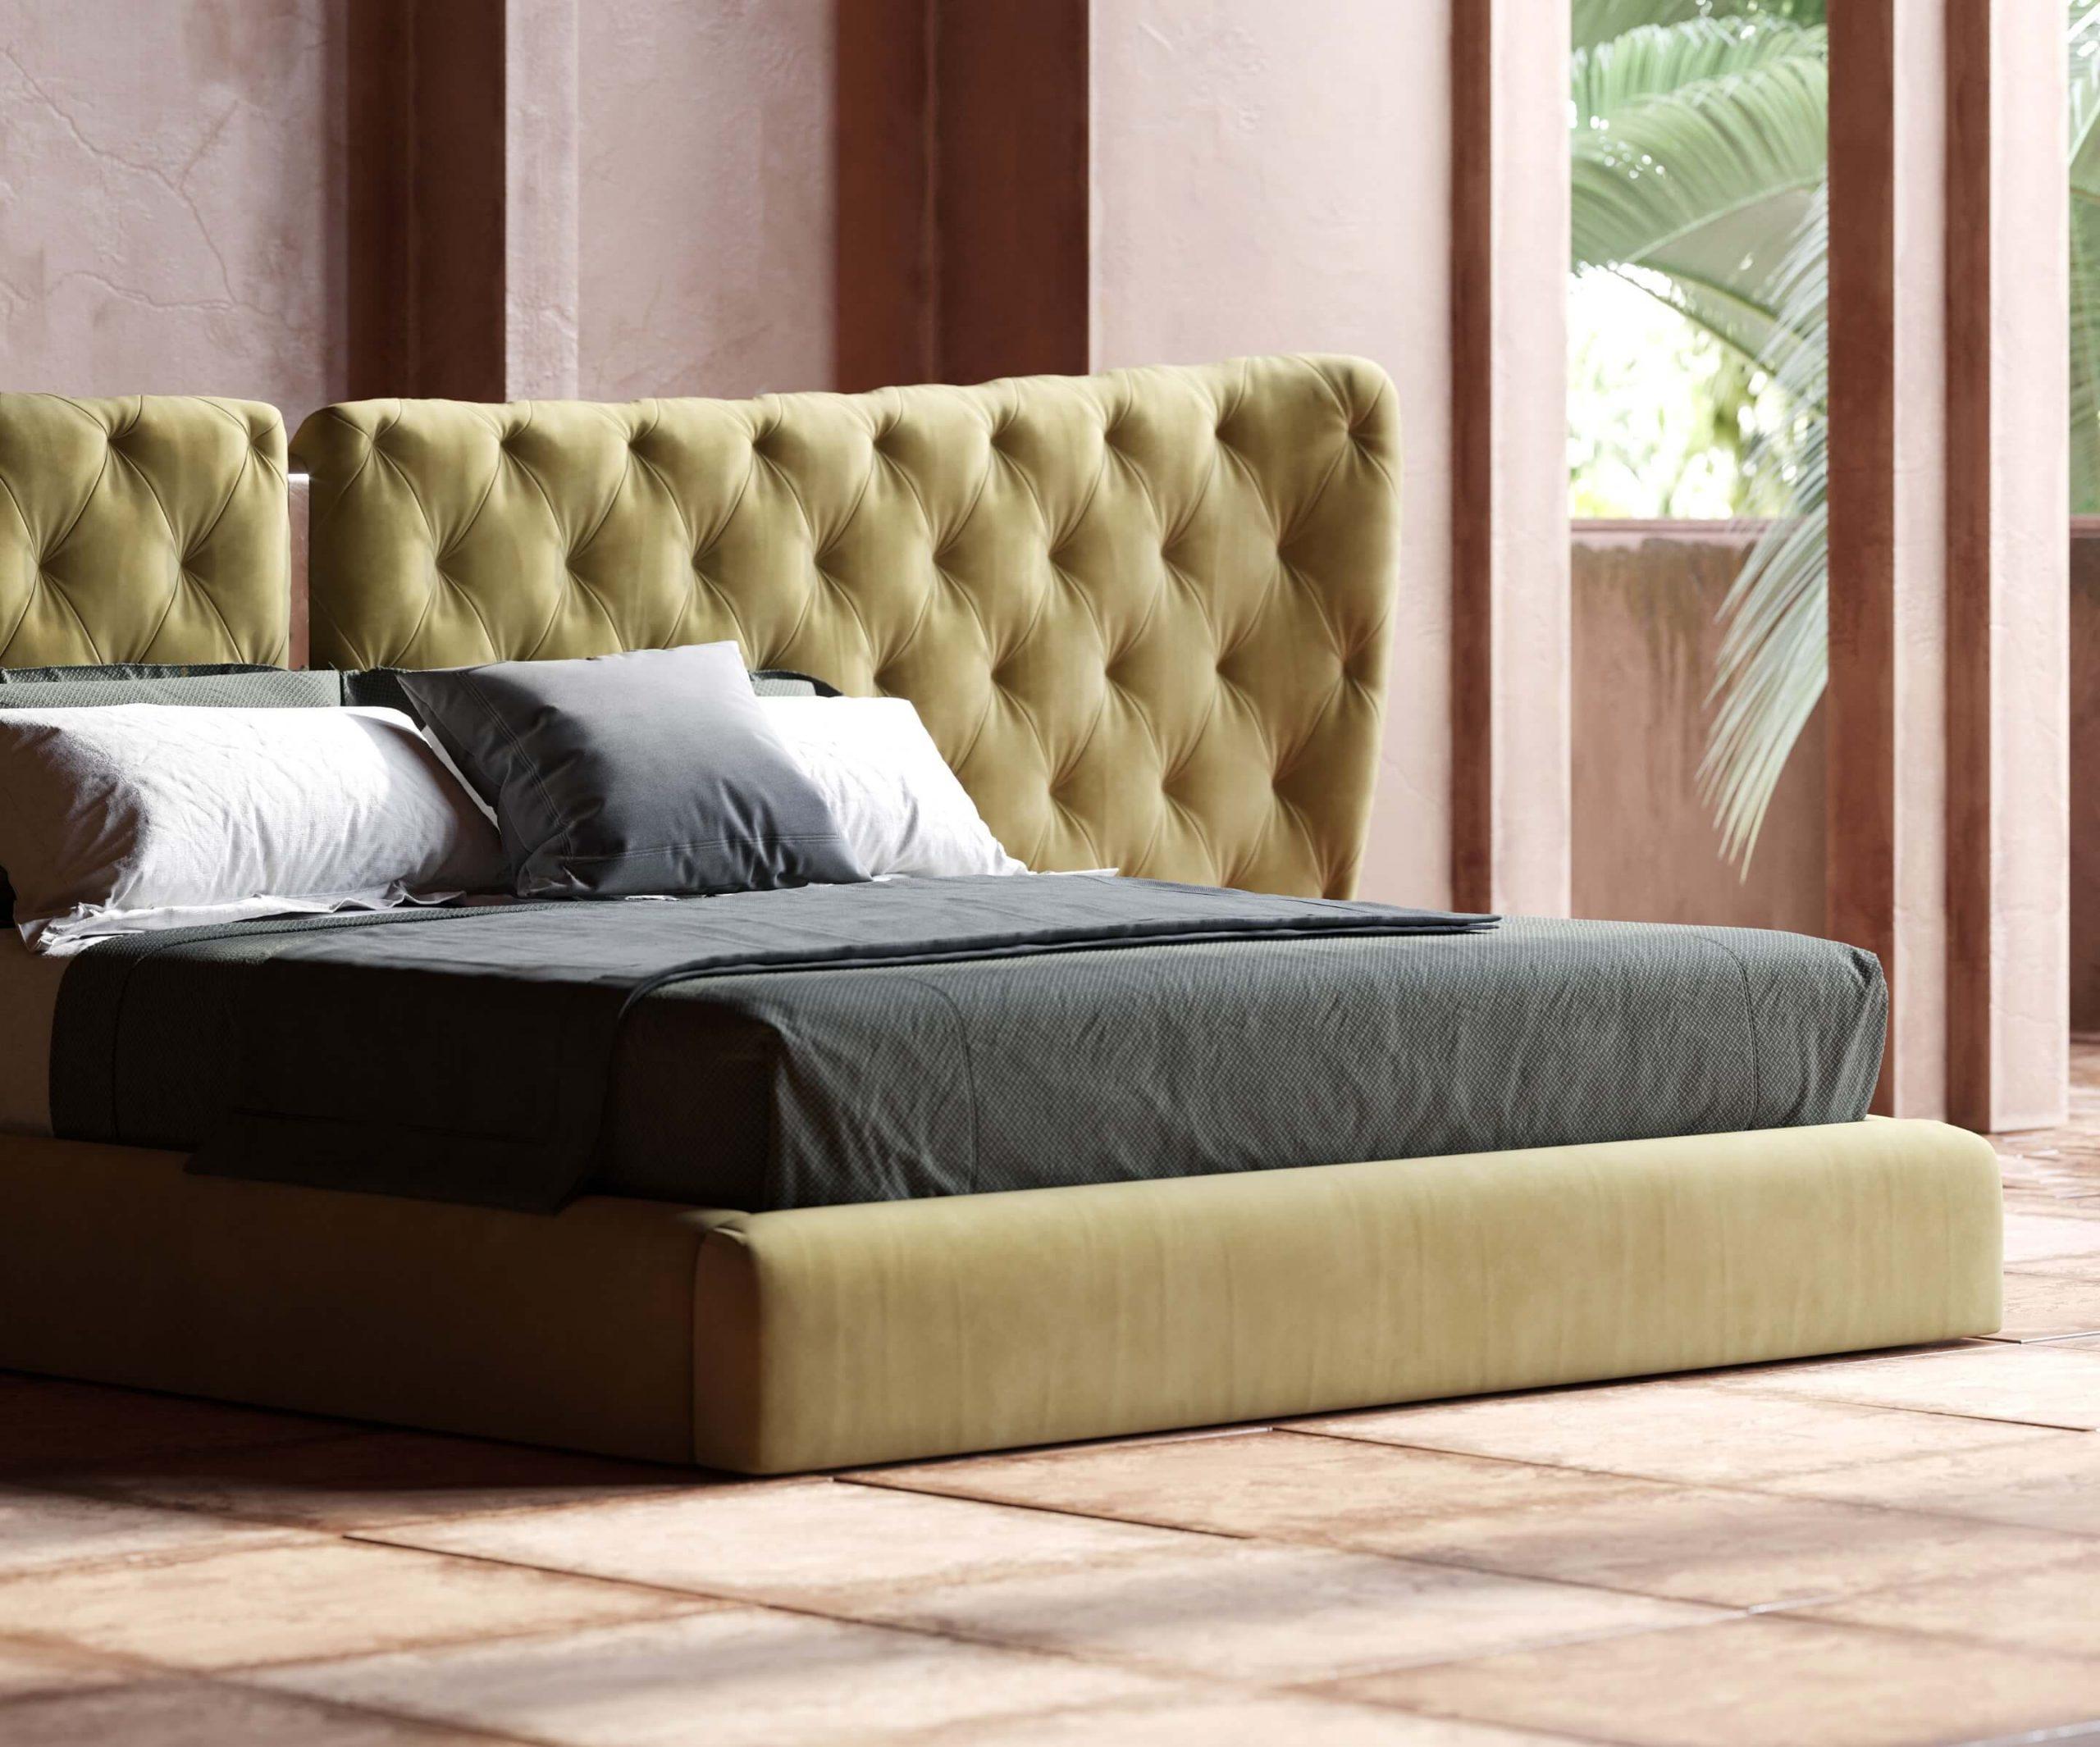 Monroe Bed Velvet Headboard Capitone Master Bedroom Design Decor Domkapa 7 Domkapa